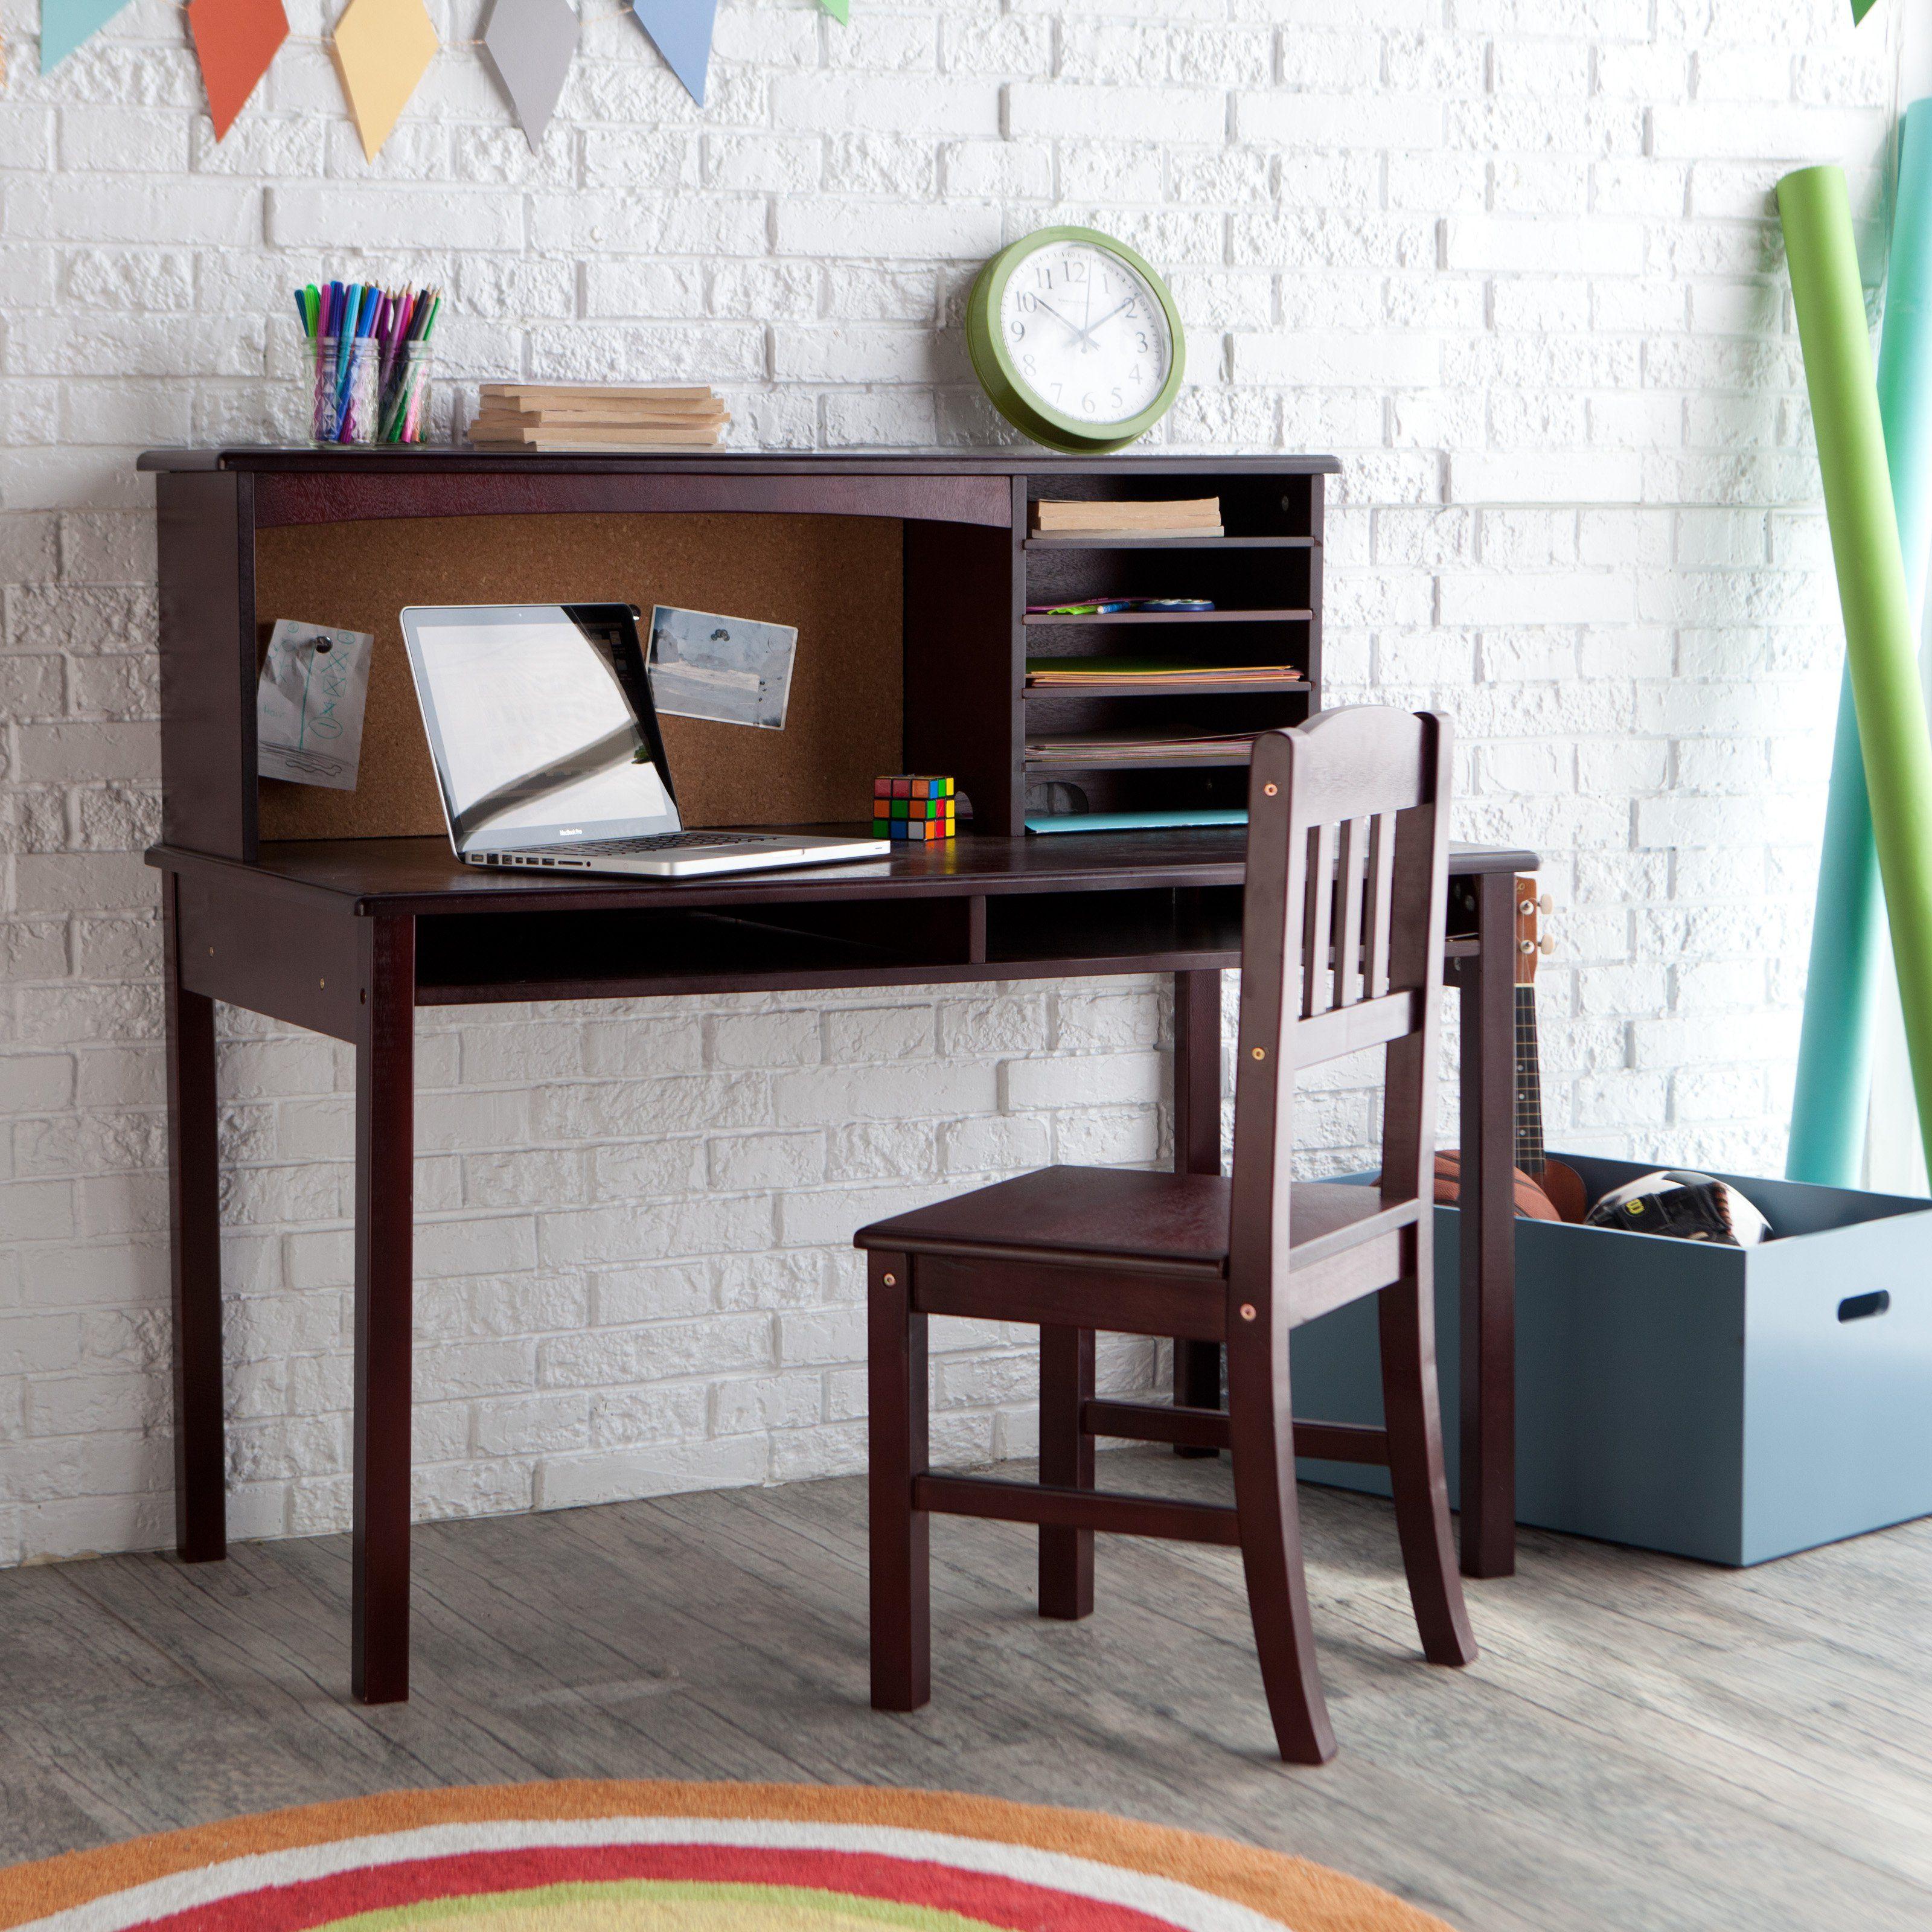 Guidecraft Media Desk Chair Set Espresso Www Hayneedle Com Desk And Chair Set Best Home Office Desk Childrens Desk And Chair